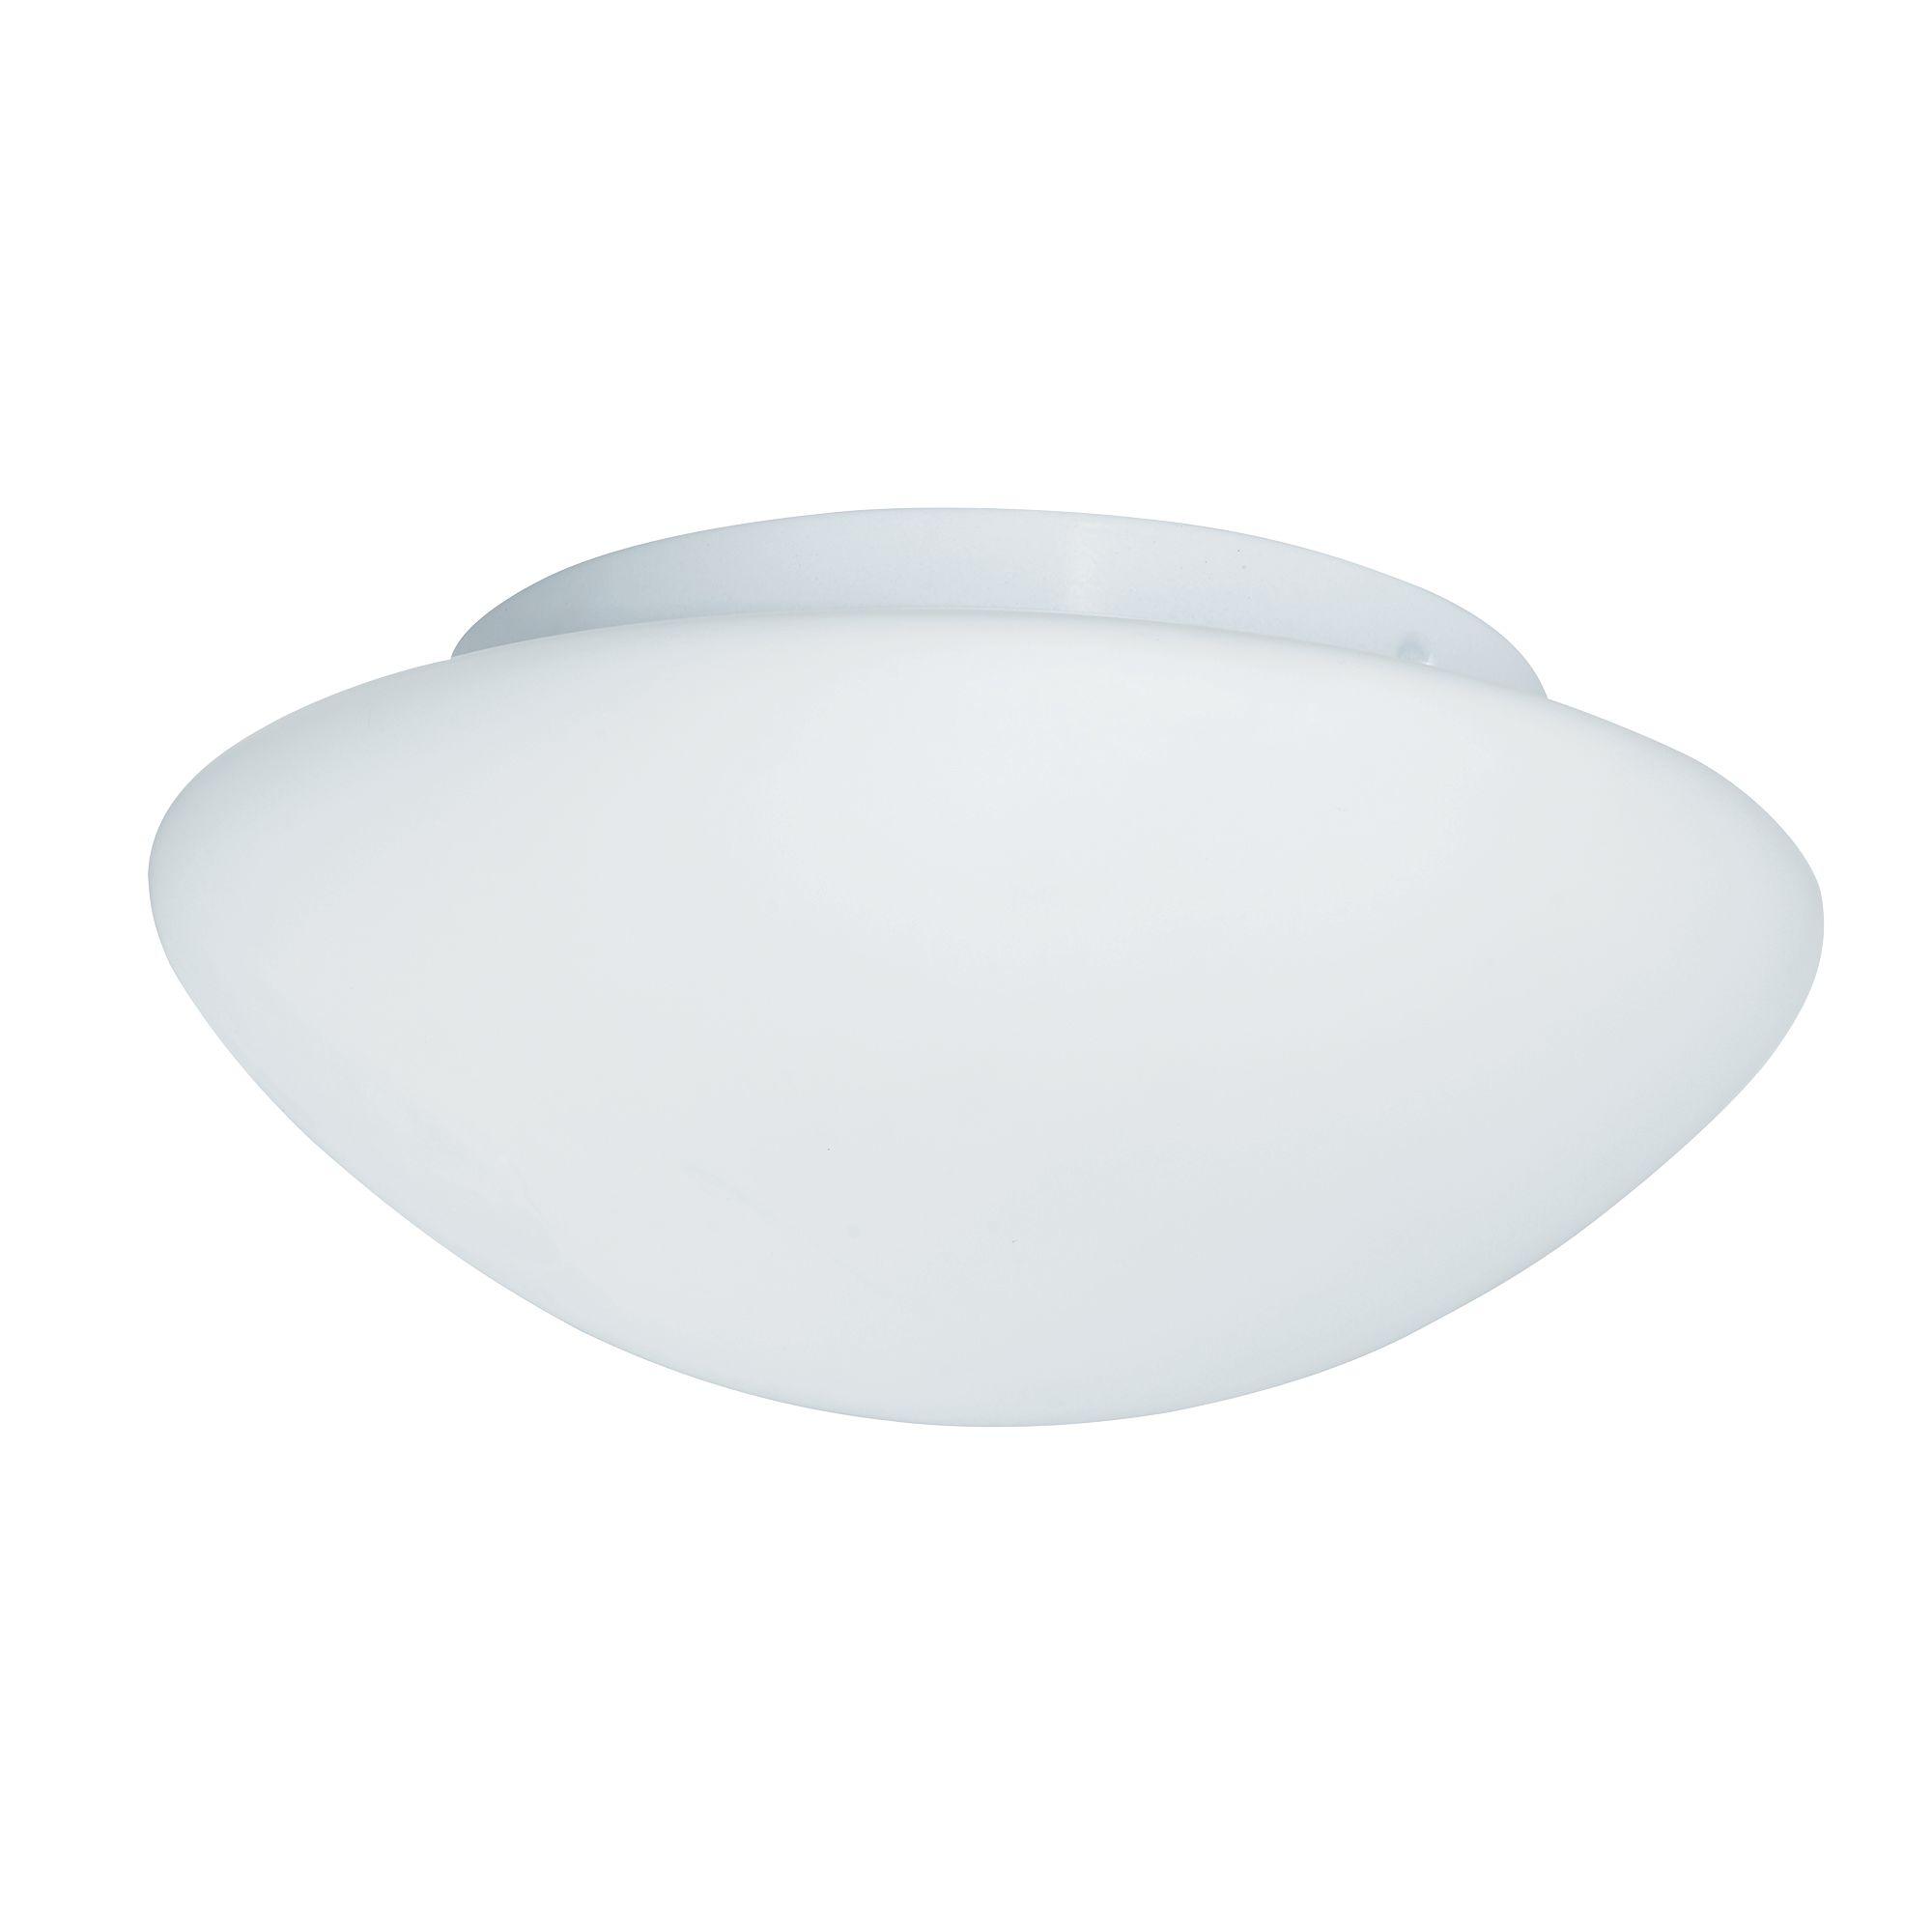 Ip44 White Flush Fitting, Opal Glass